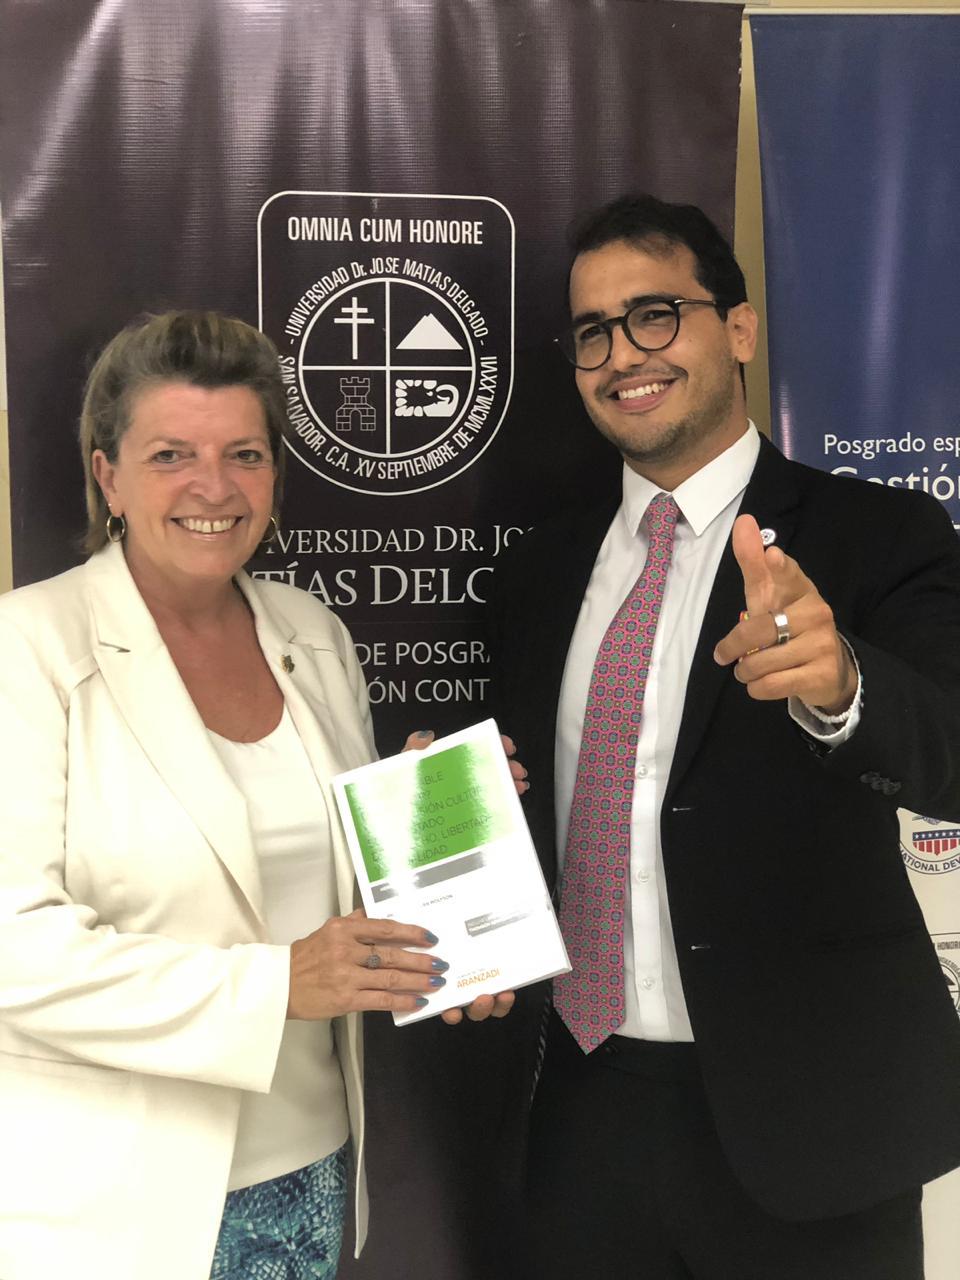 Herman Duarte y Marsye Guil.bouldt embajadora de canada.jpg